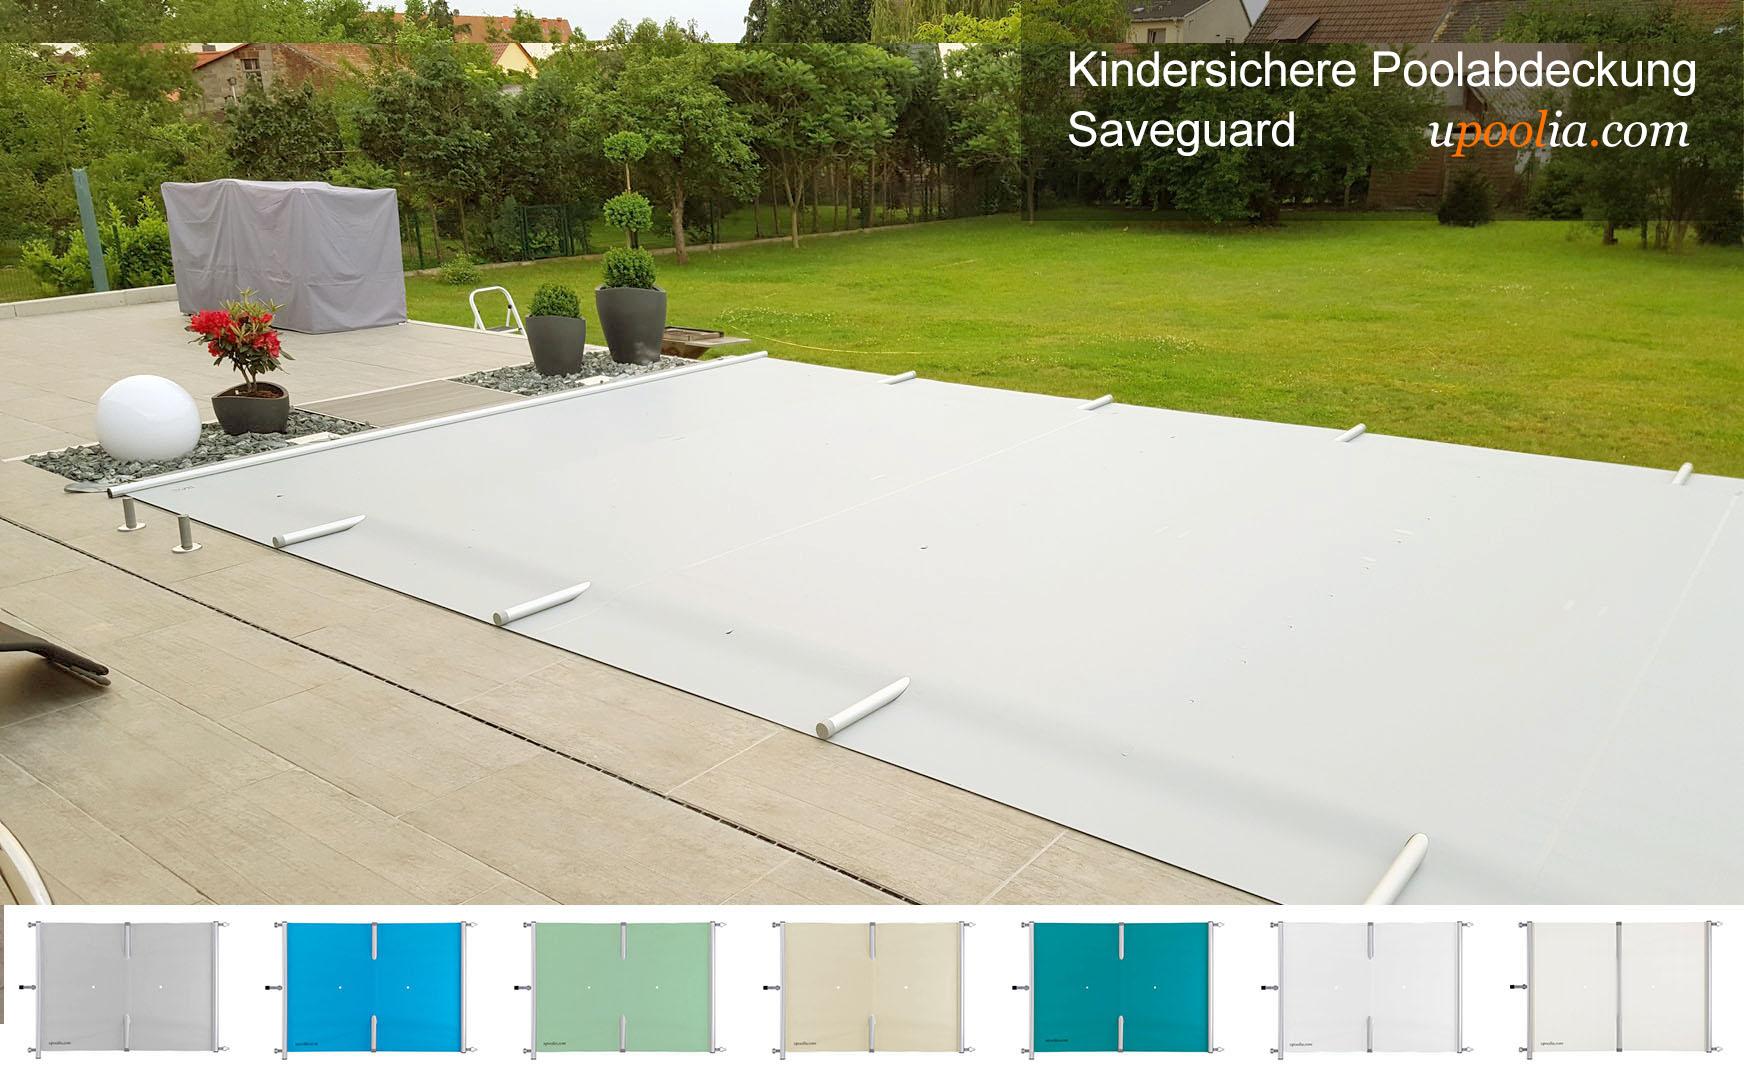 Rollschutzabdeckung set upoolia saveguard f r pool for Schwimmfolie pool